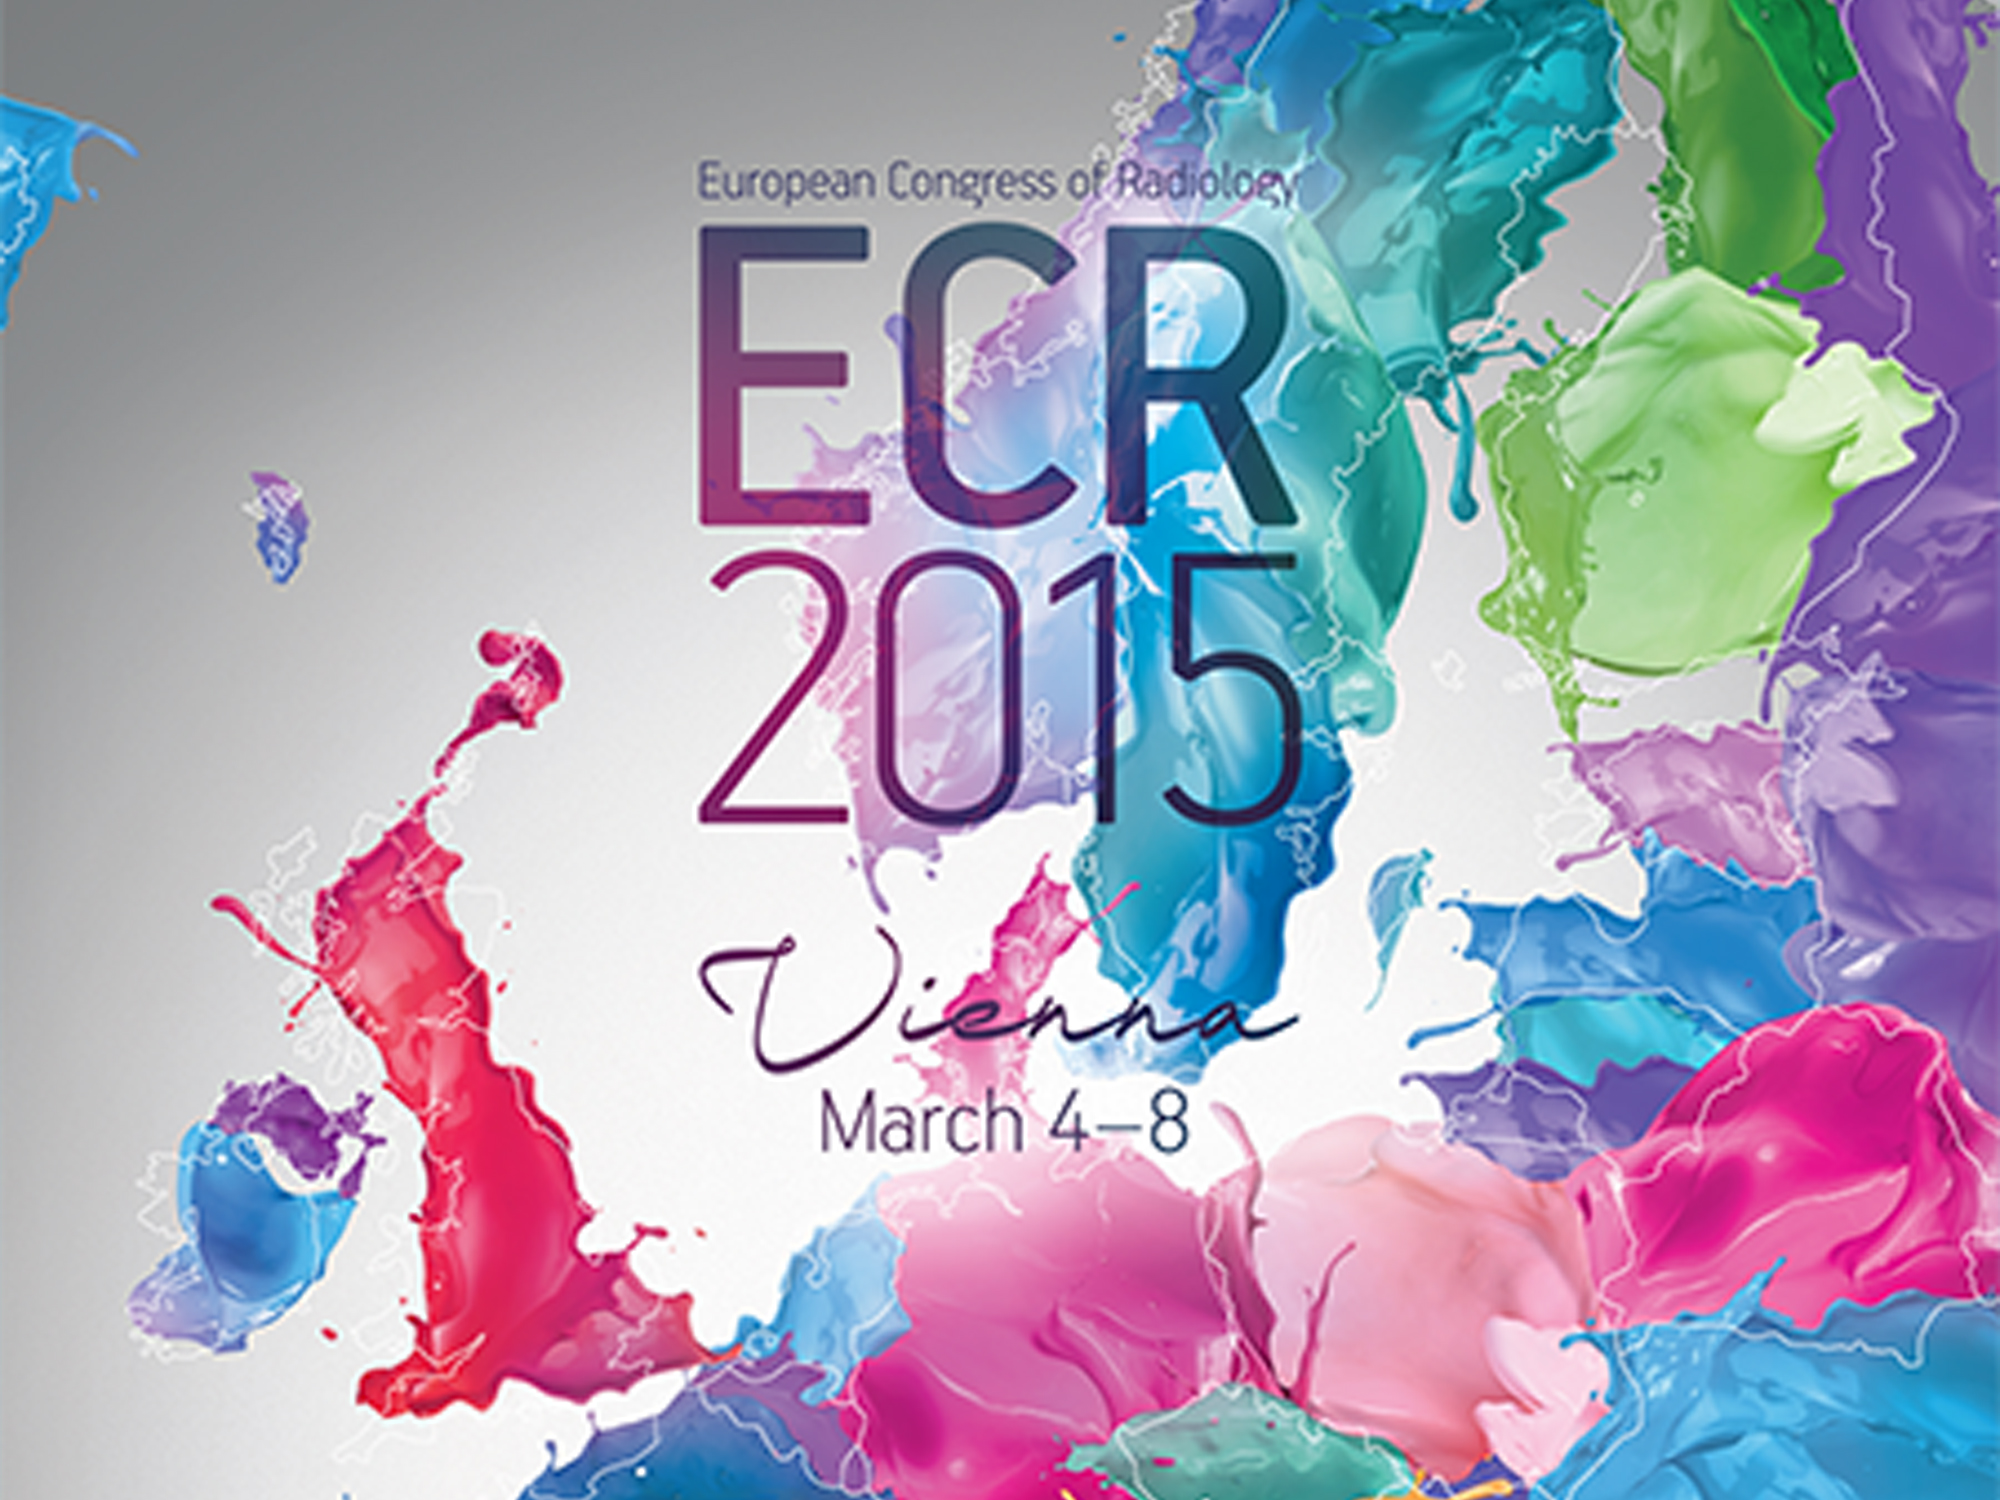 ECR 2015 (European Congress of Radiology)